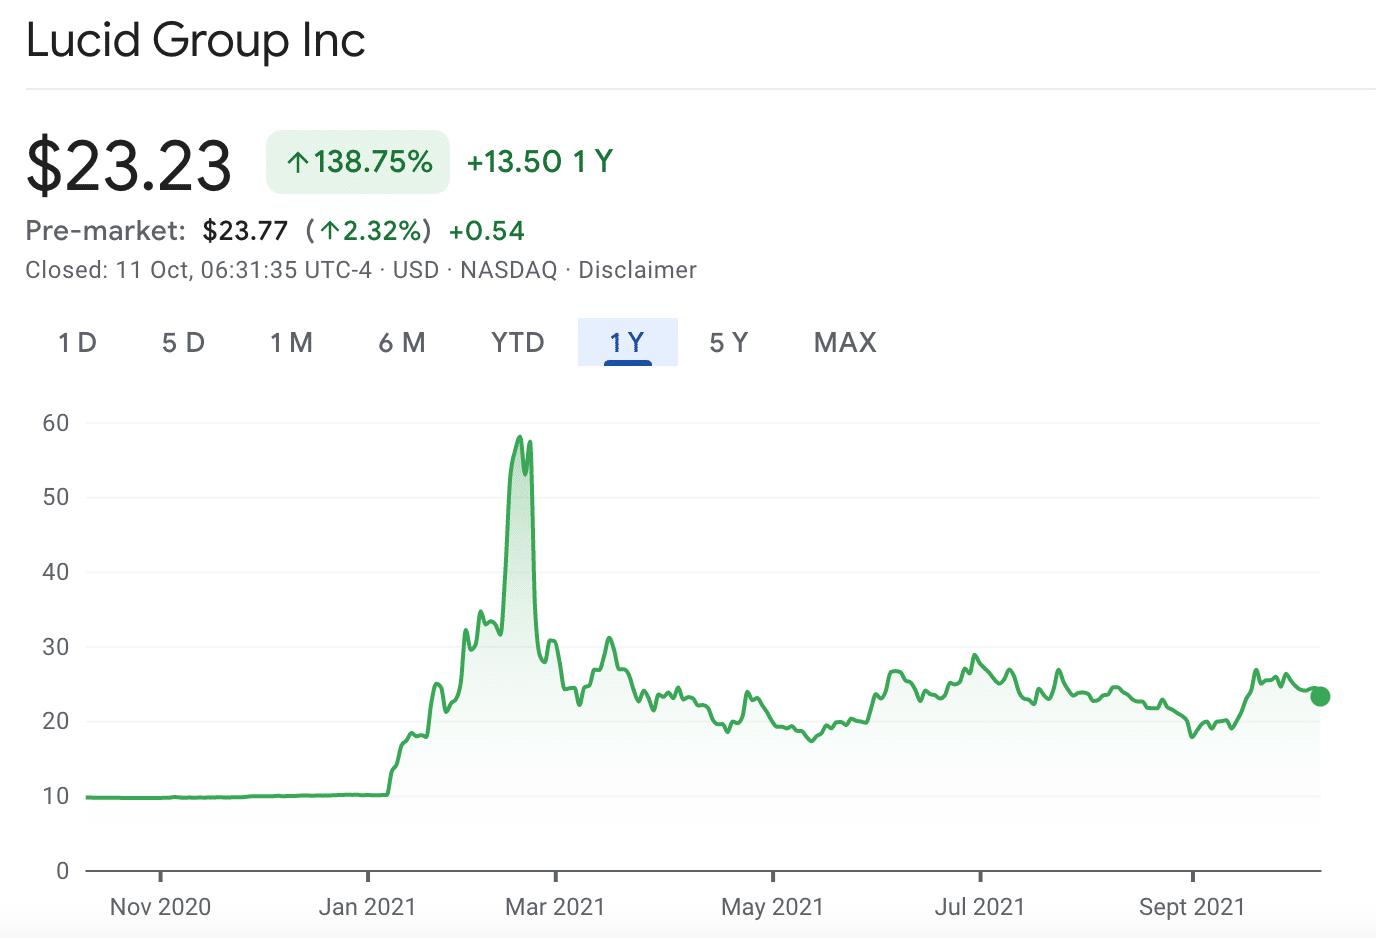 LCID stock price